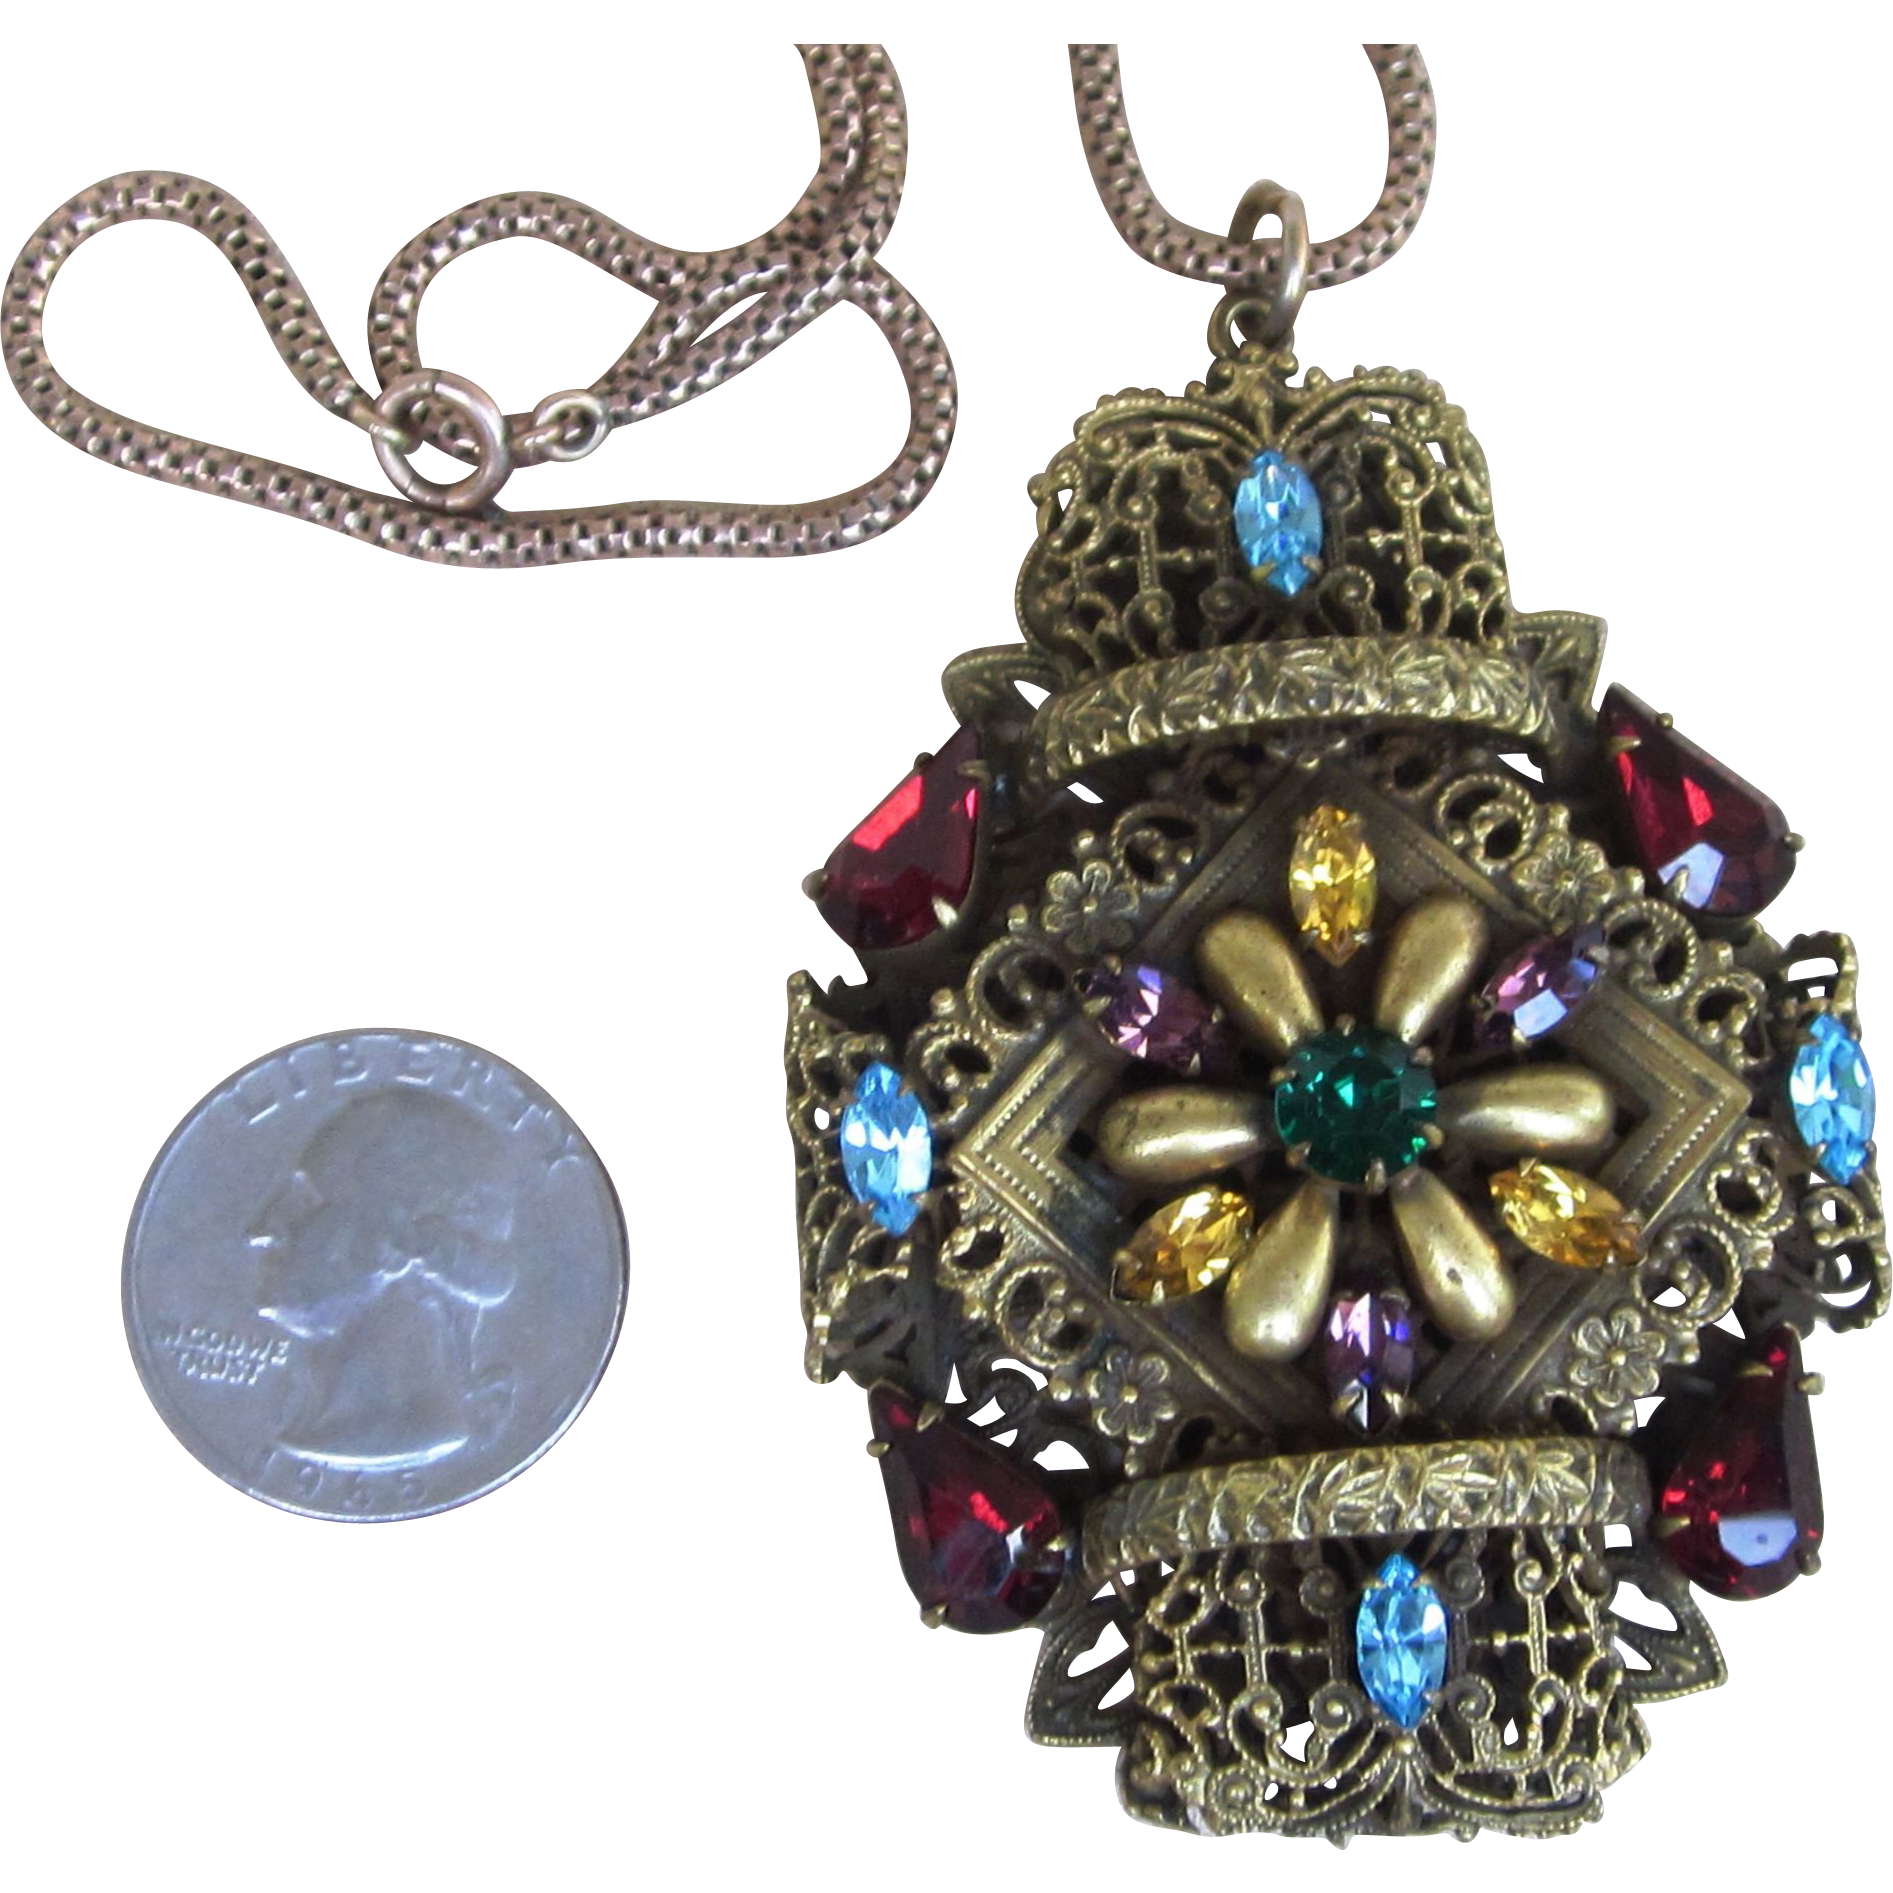 3 Inch Czech Fabulous Ornate Rhinestone Vintage  Pendant Necklace